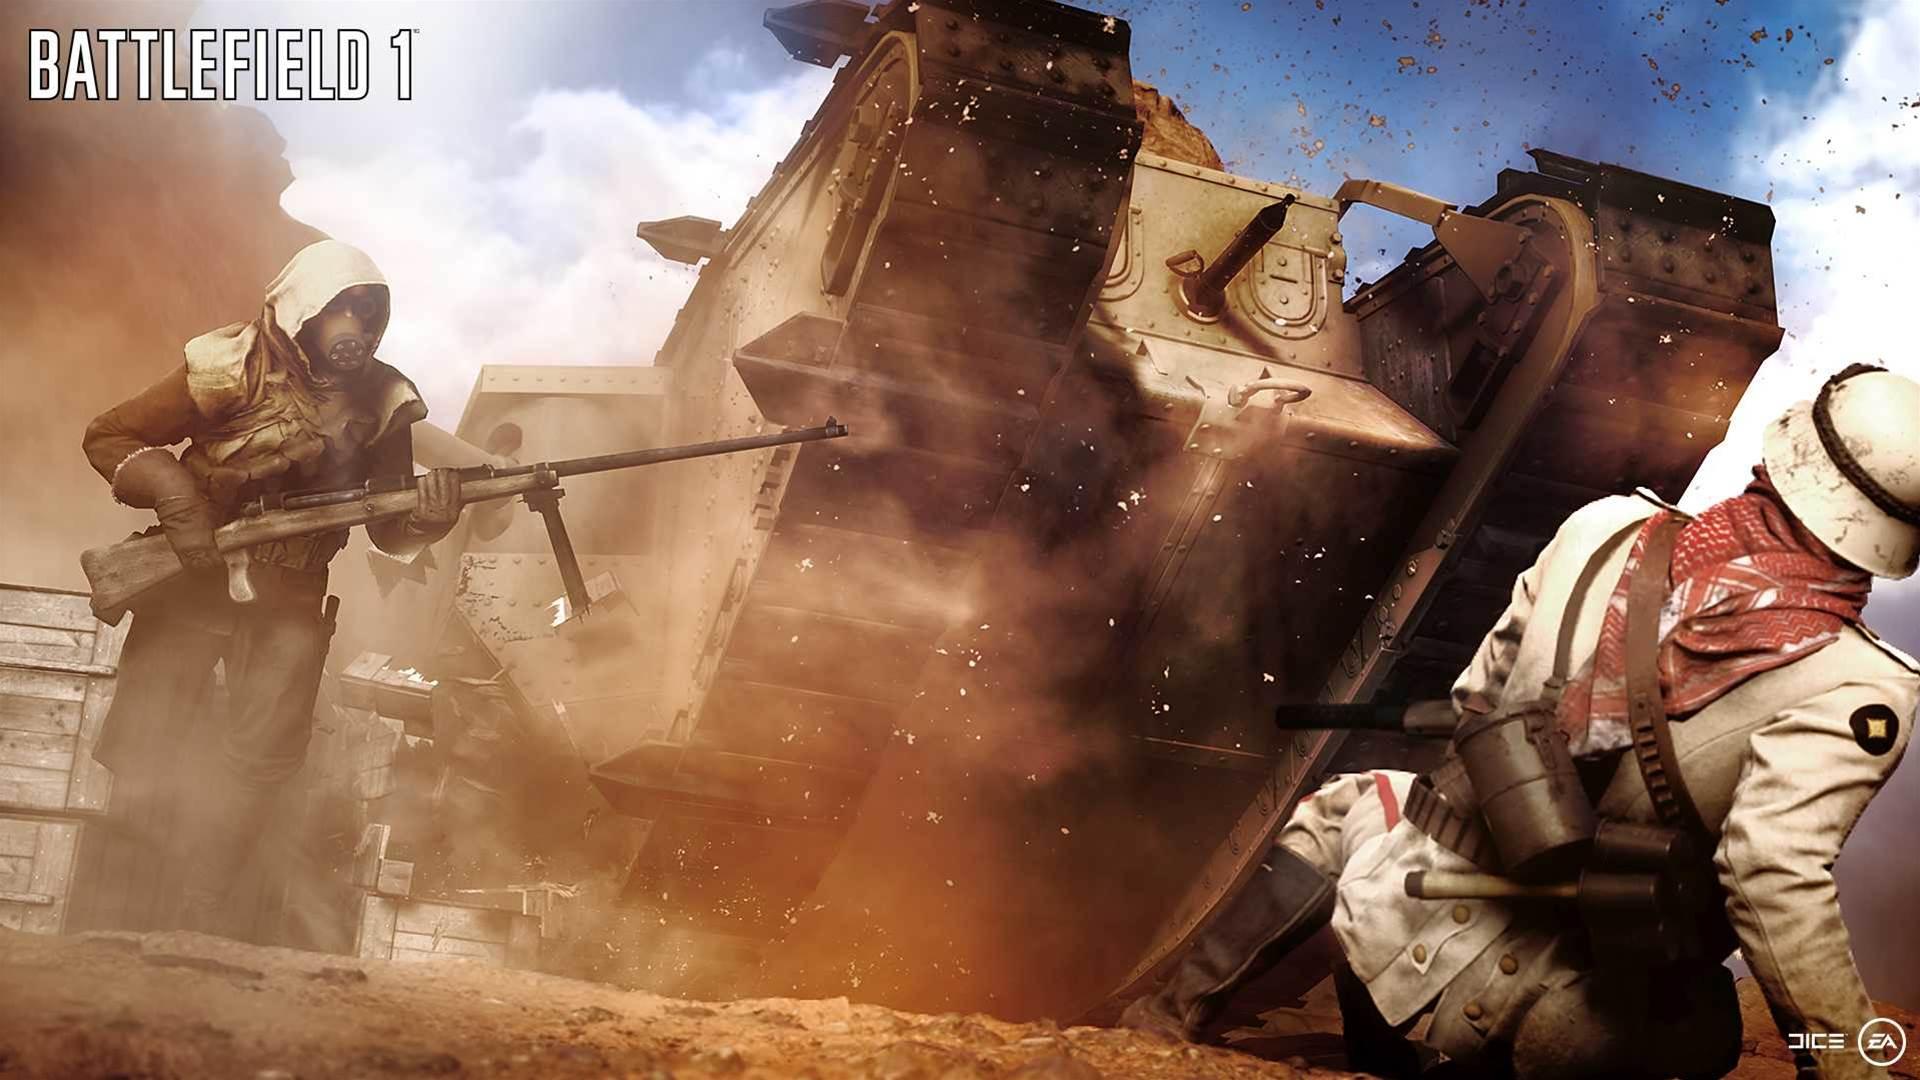 Beautiful Battlefield 1 game engine shots